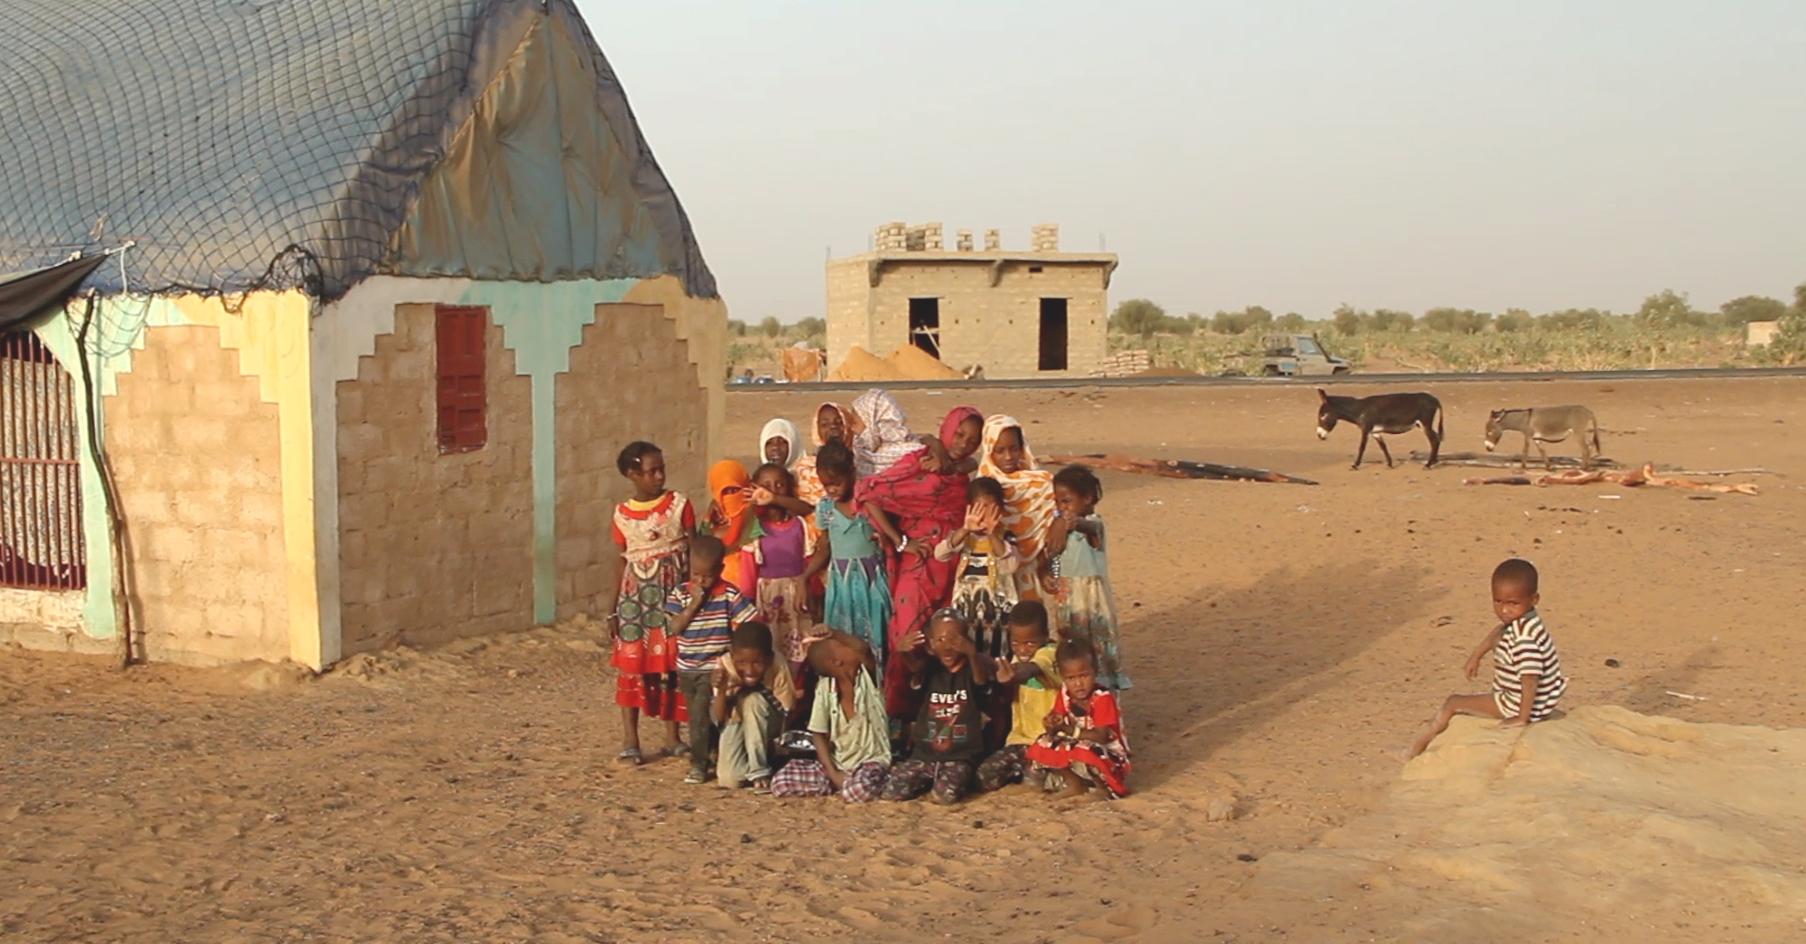 despedida gogui mauritania pablocaminante - Mauritania 5/5, Gogui